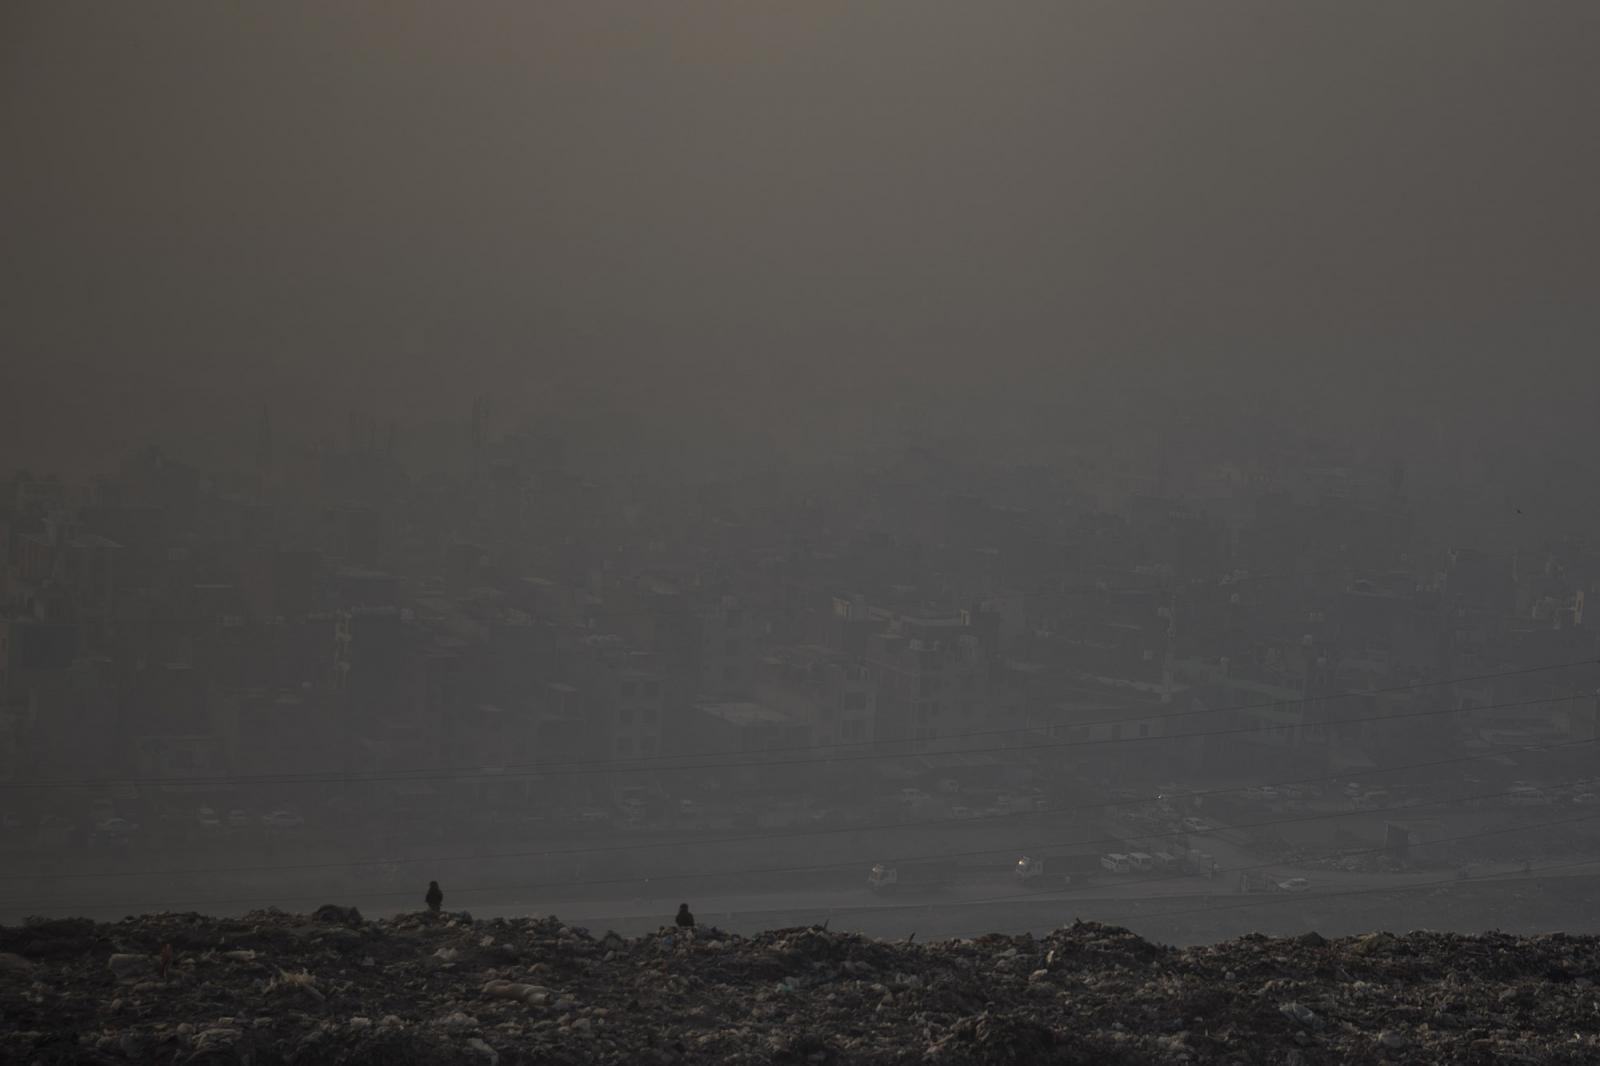 Photography image - Loading 01_Santi_Palacios_Delhi_Hills.jpg